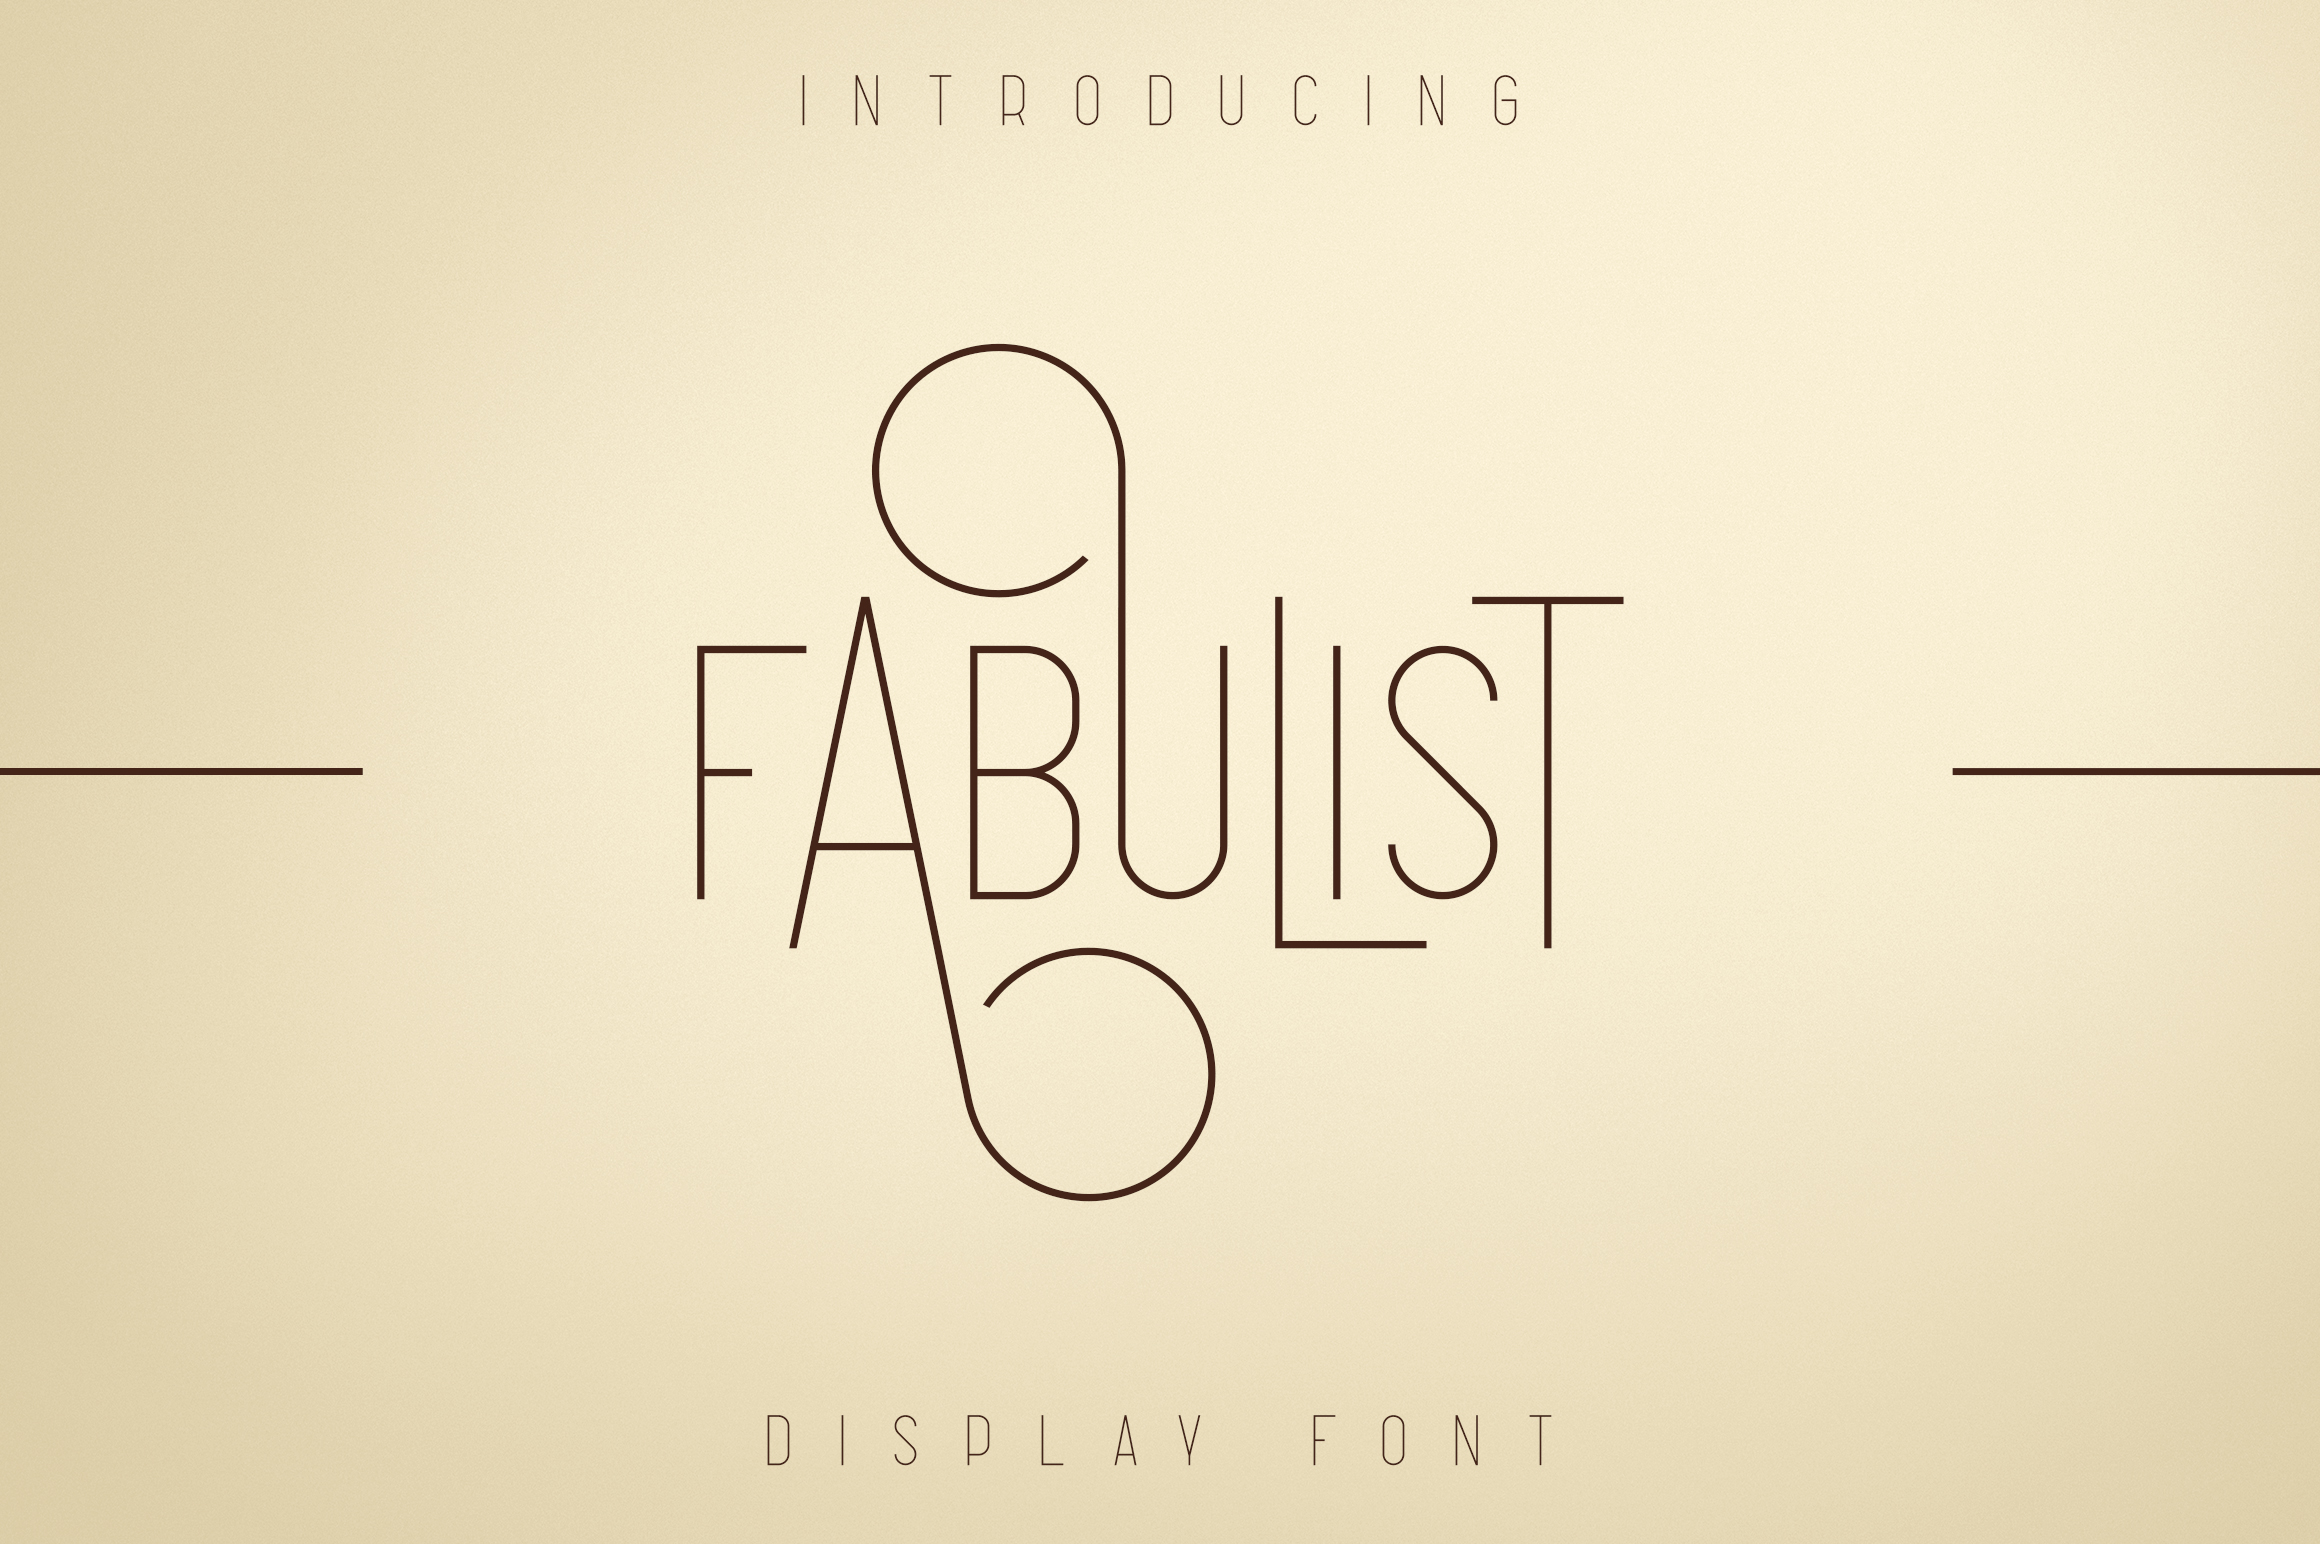 Fabulist - Display font example image 1